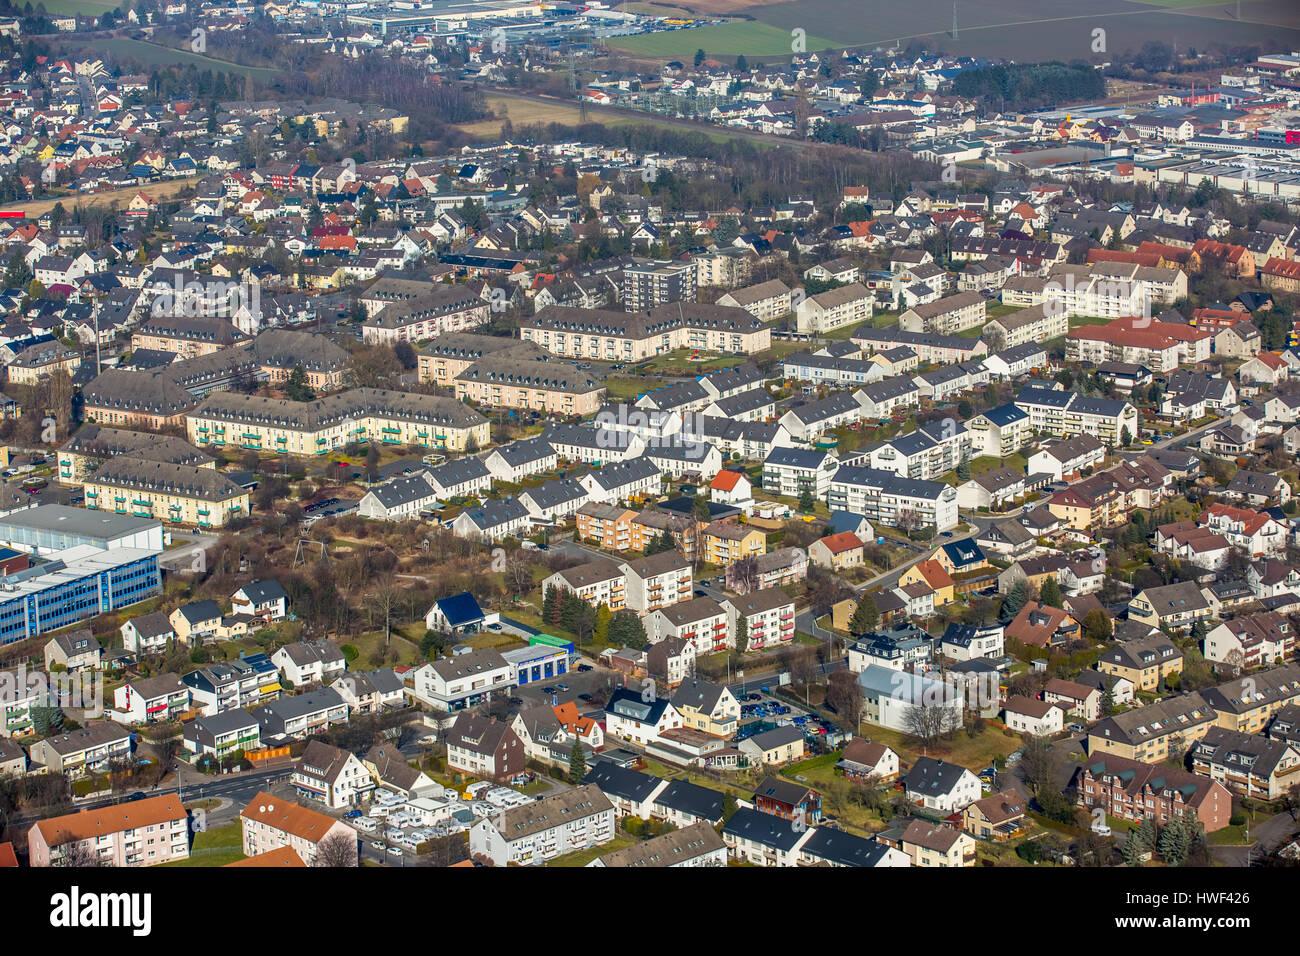 Platteheide, former barracks, former NAAFI Menden, Sauerland, North Rhine-Westphalia, Germany, Platte Heide, ehemalige - Stock Image